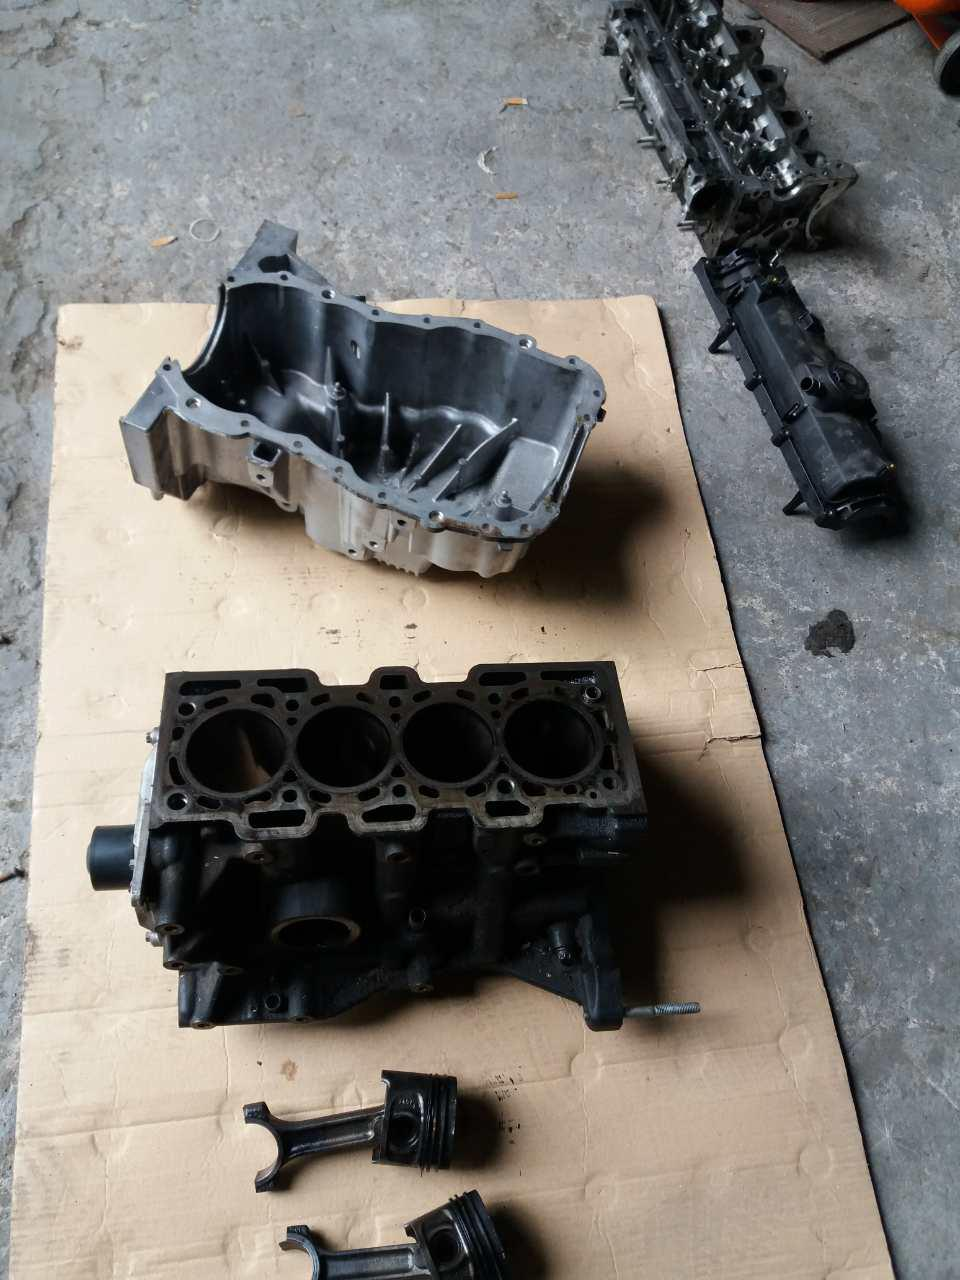 Б/у поршень / шатун двигуна Evro5 55 кВт 66 кВт Renault Kangoo 1.5 DCI 5-ступка Рено Кенго 2010-2015 р. р.